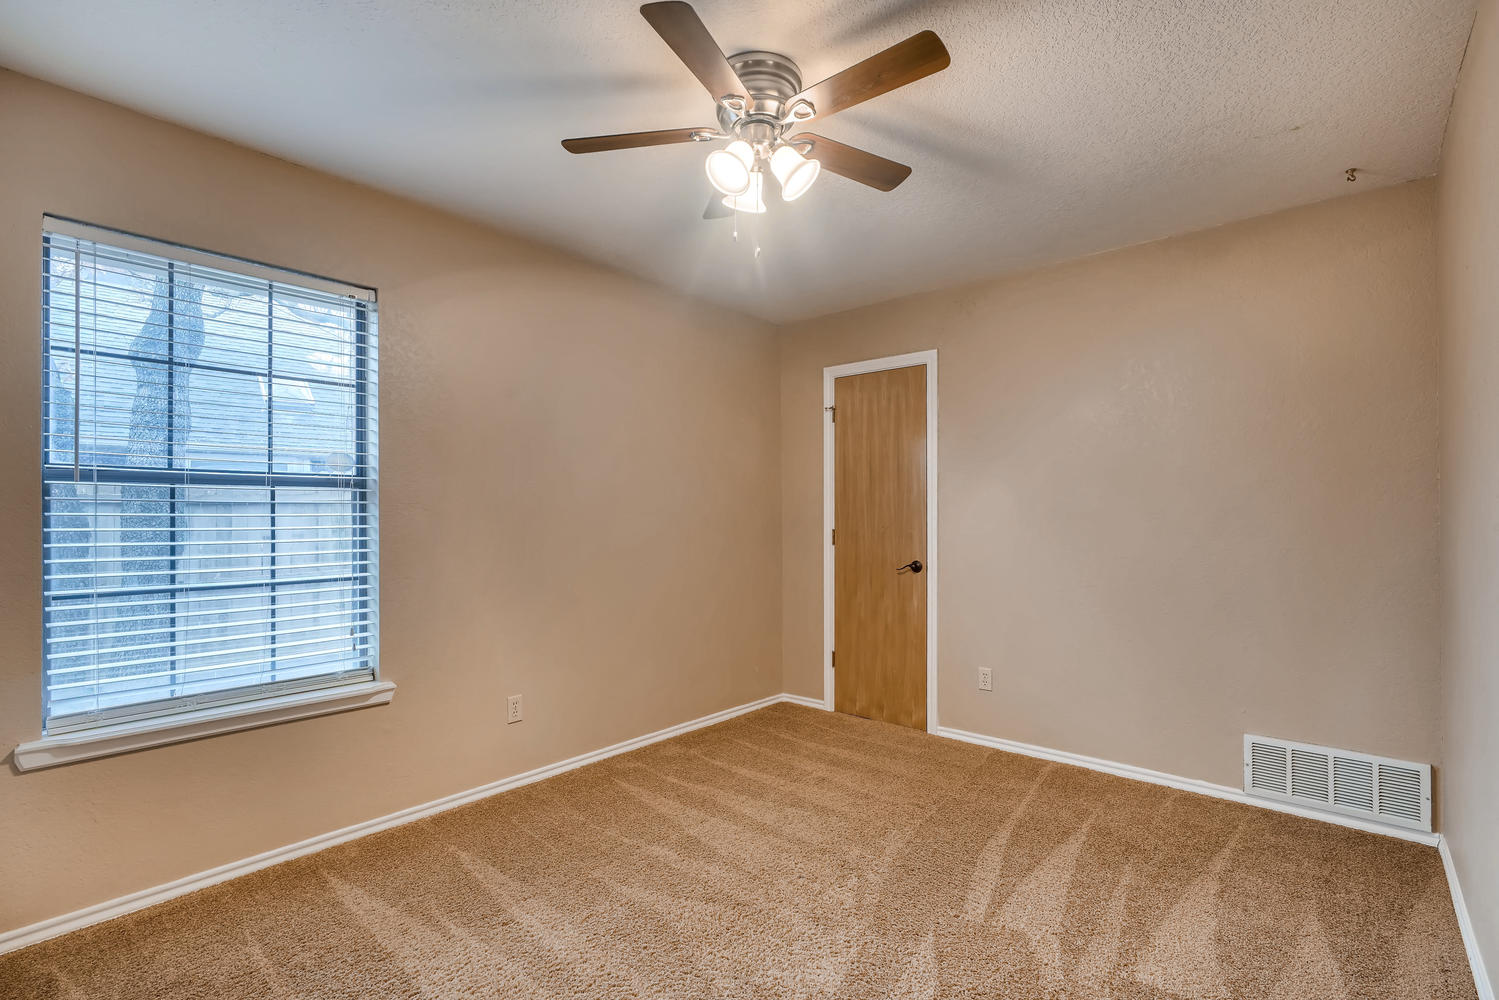 Photo of 1406 Sweetgum Circle, Keller, TX, 76248